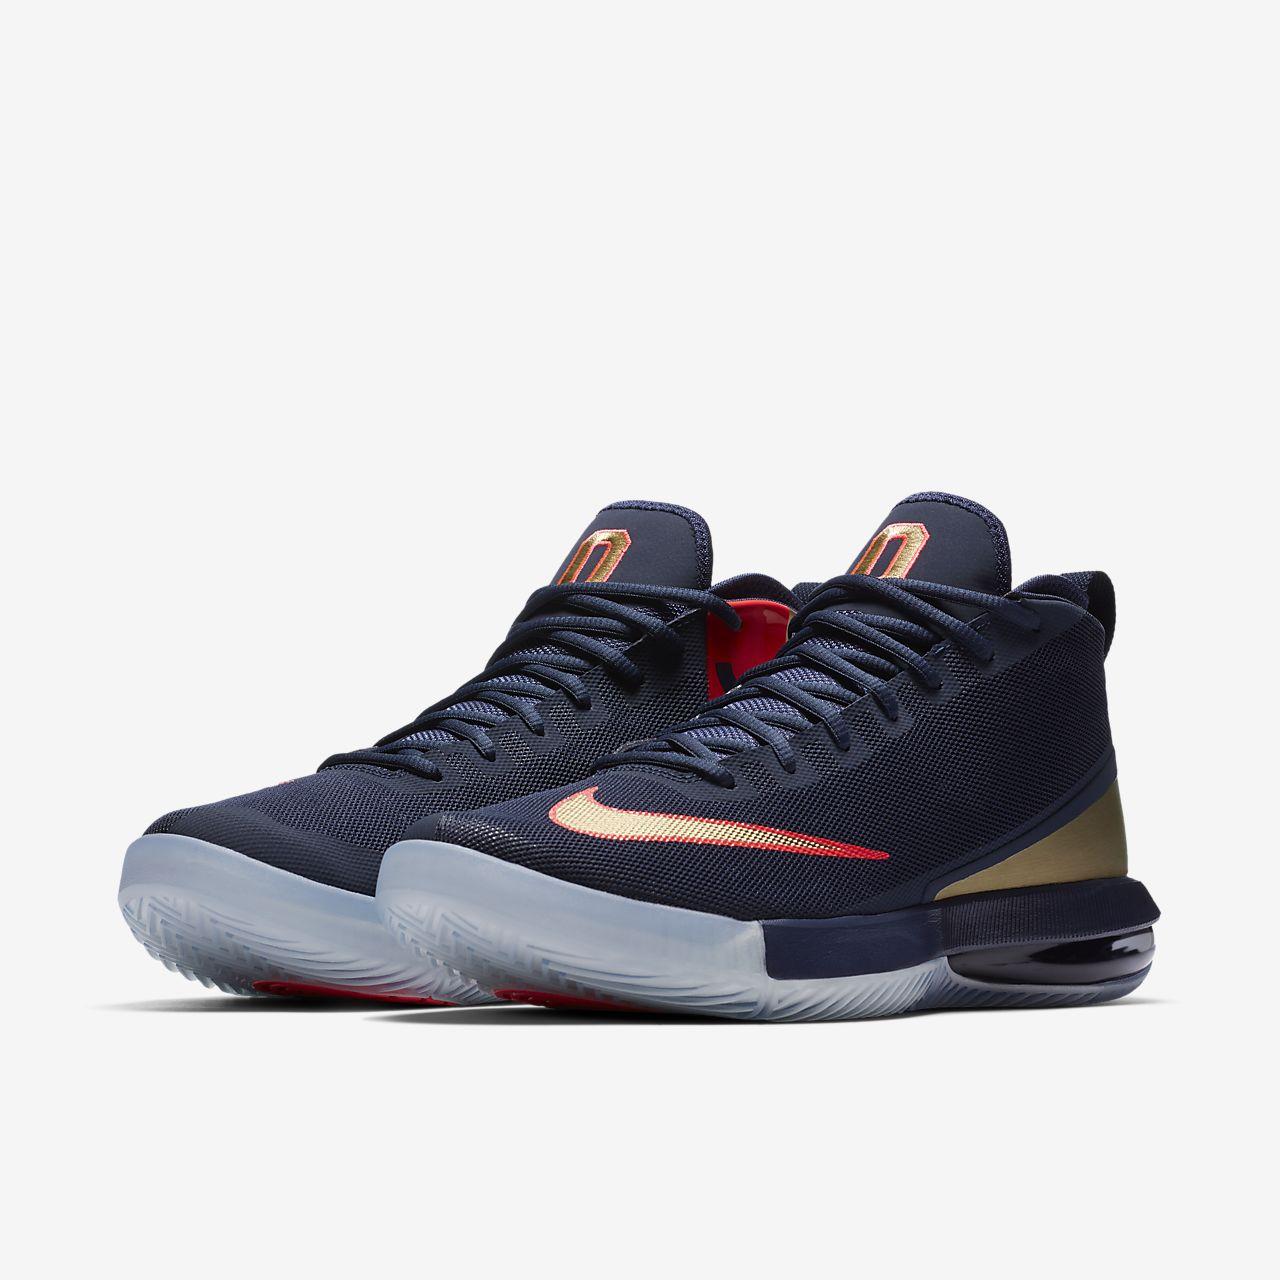 the best attitude 4d5d7 535f0 ... nike air max dominate demarcus cousins mens basketball shoe